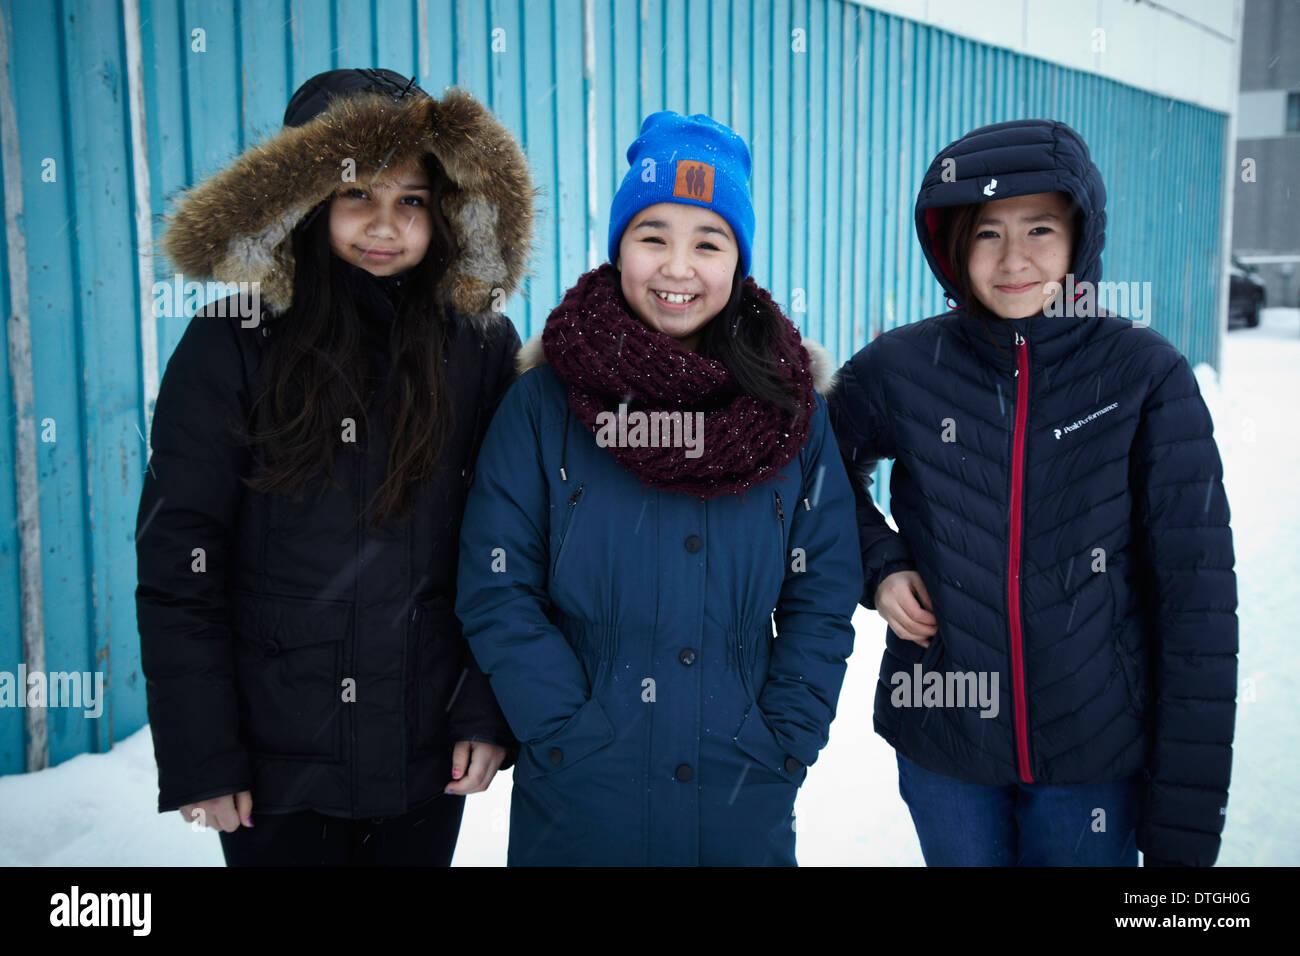 Three Greenlandic (Inuit) girls outside Nuuk shopping center in Greenland - Stock Image